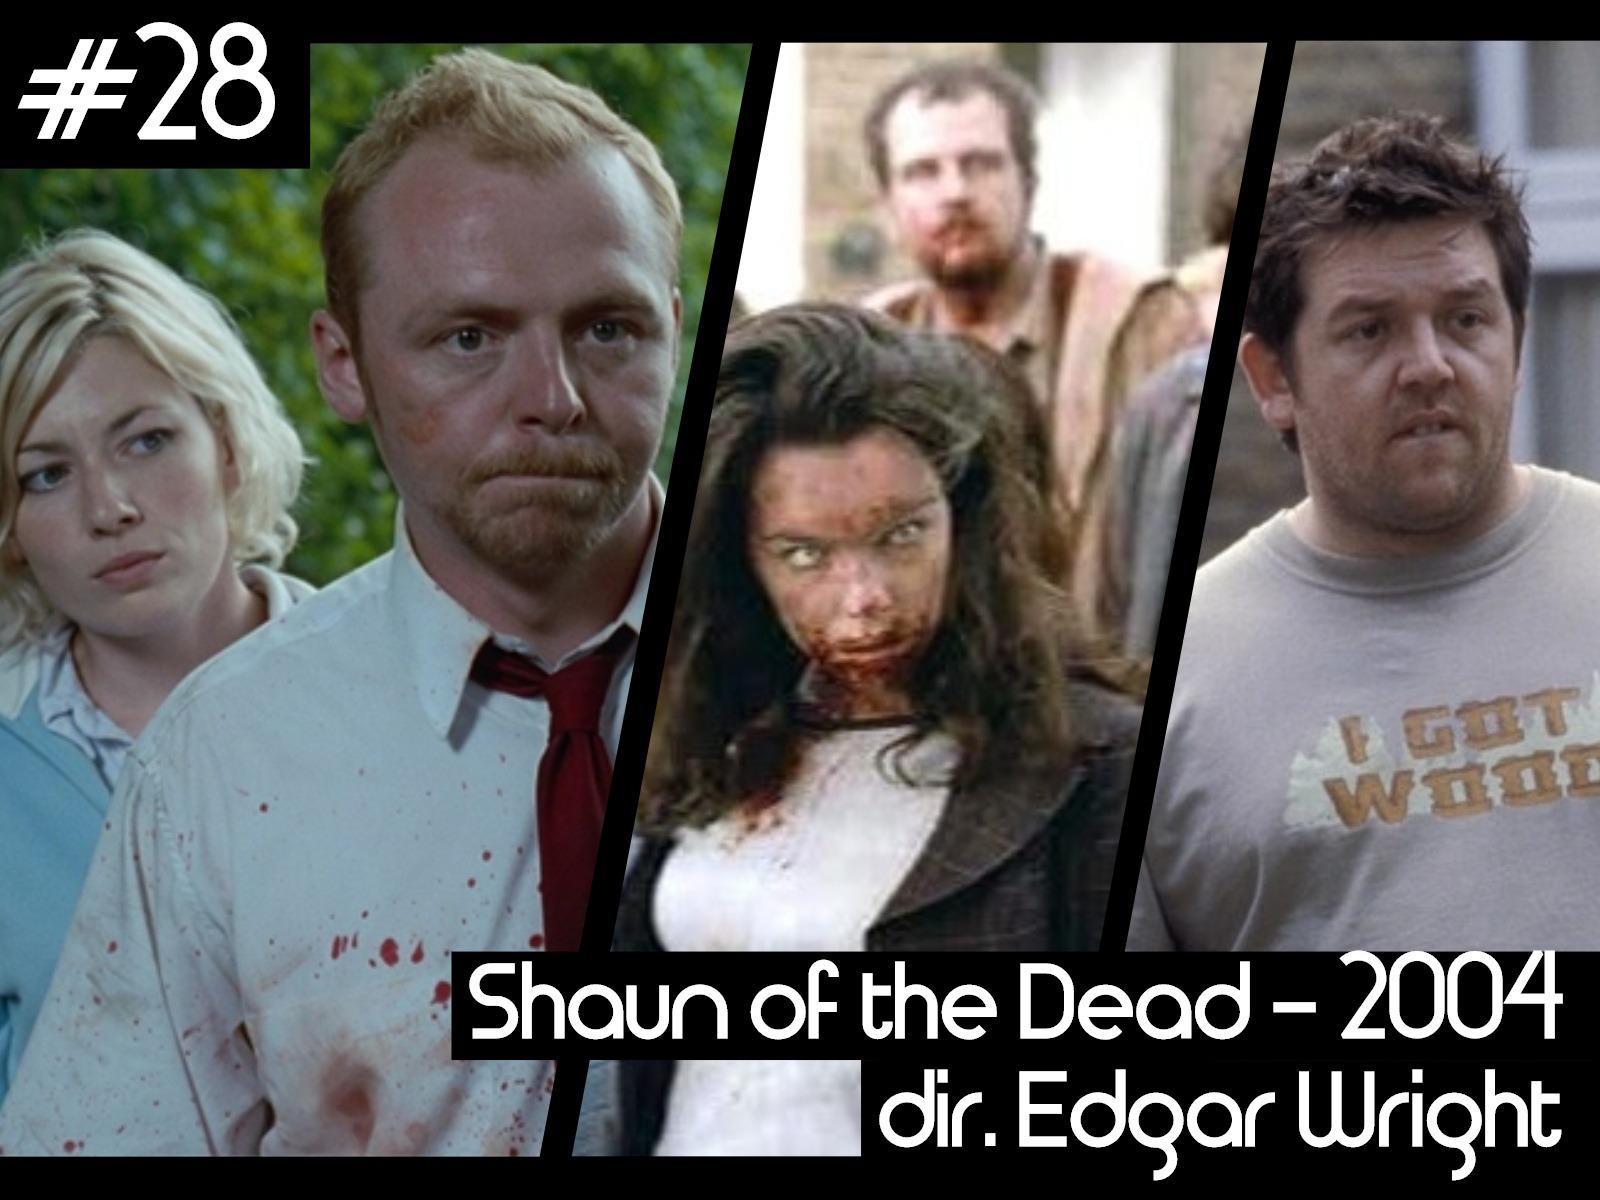 28 - shaun of the dead.jpg